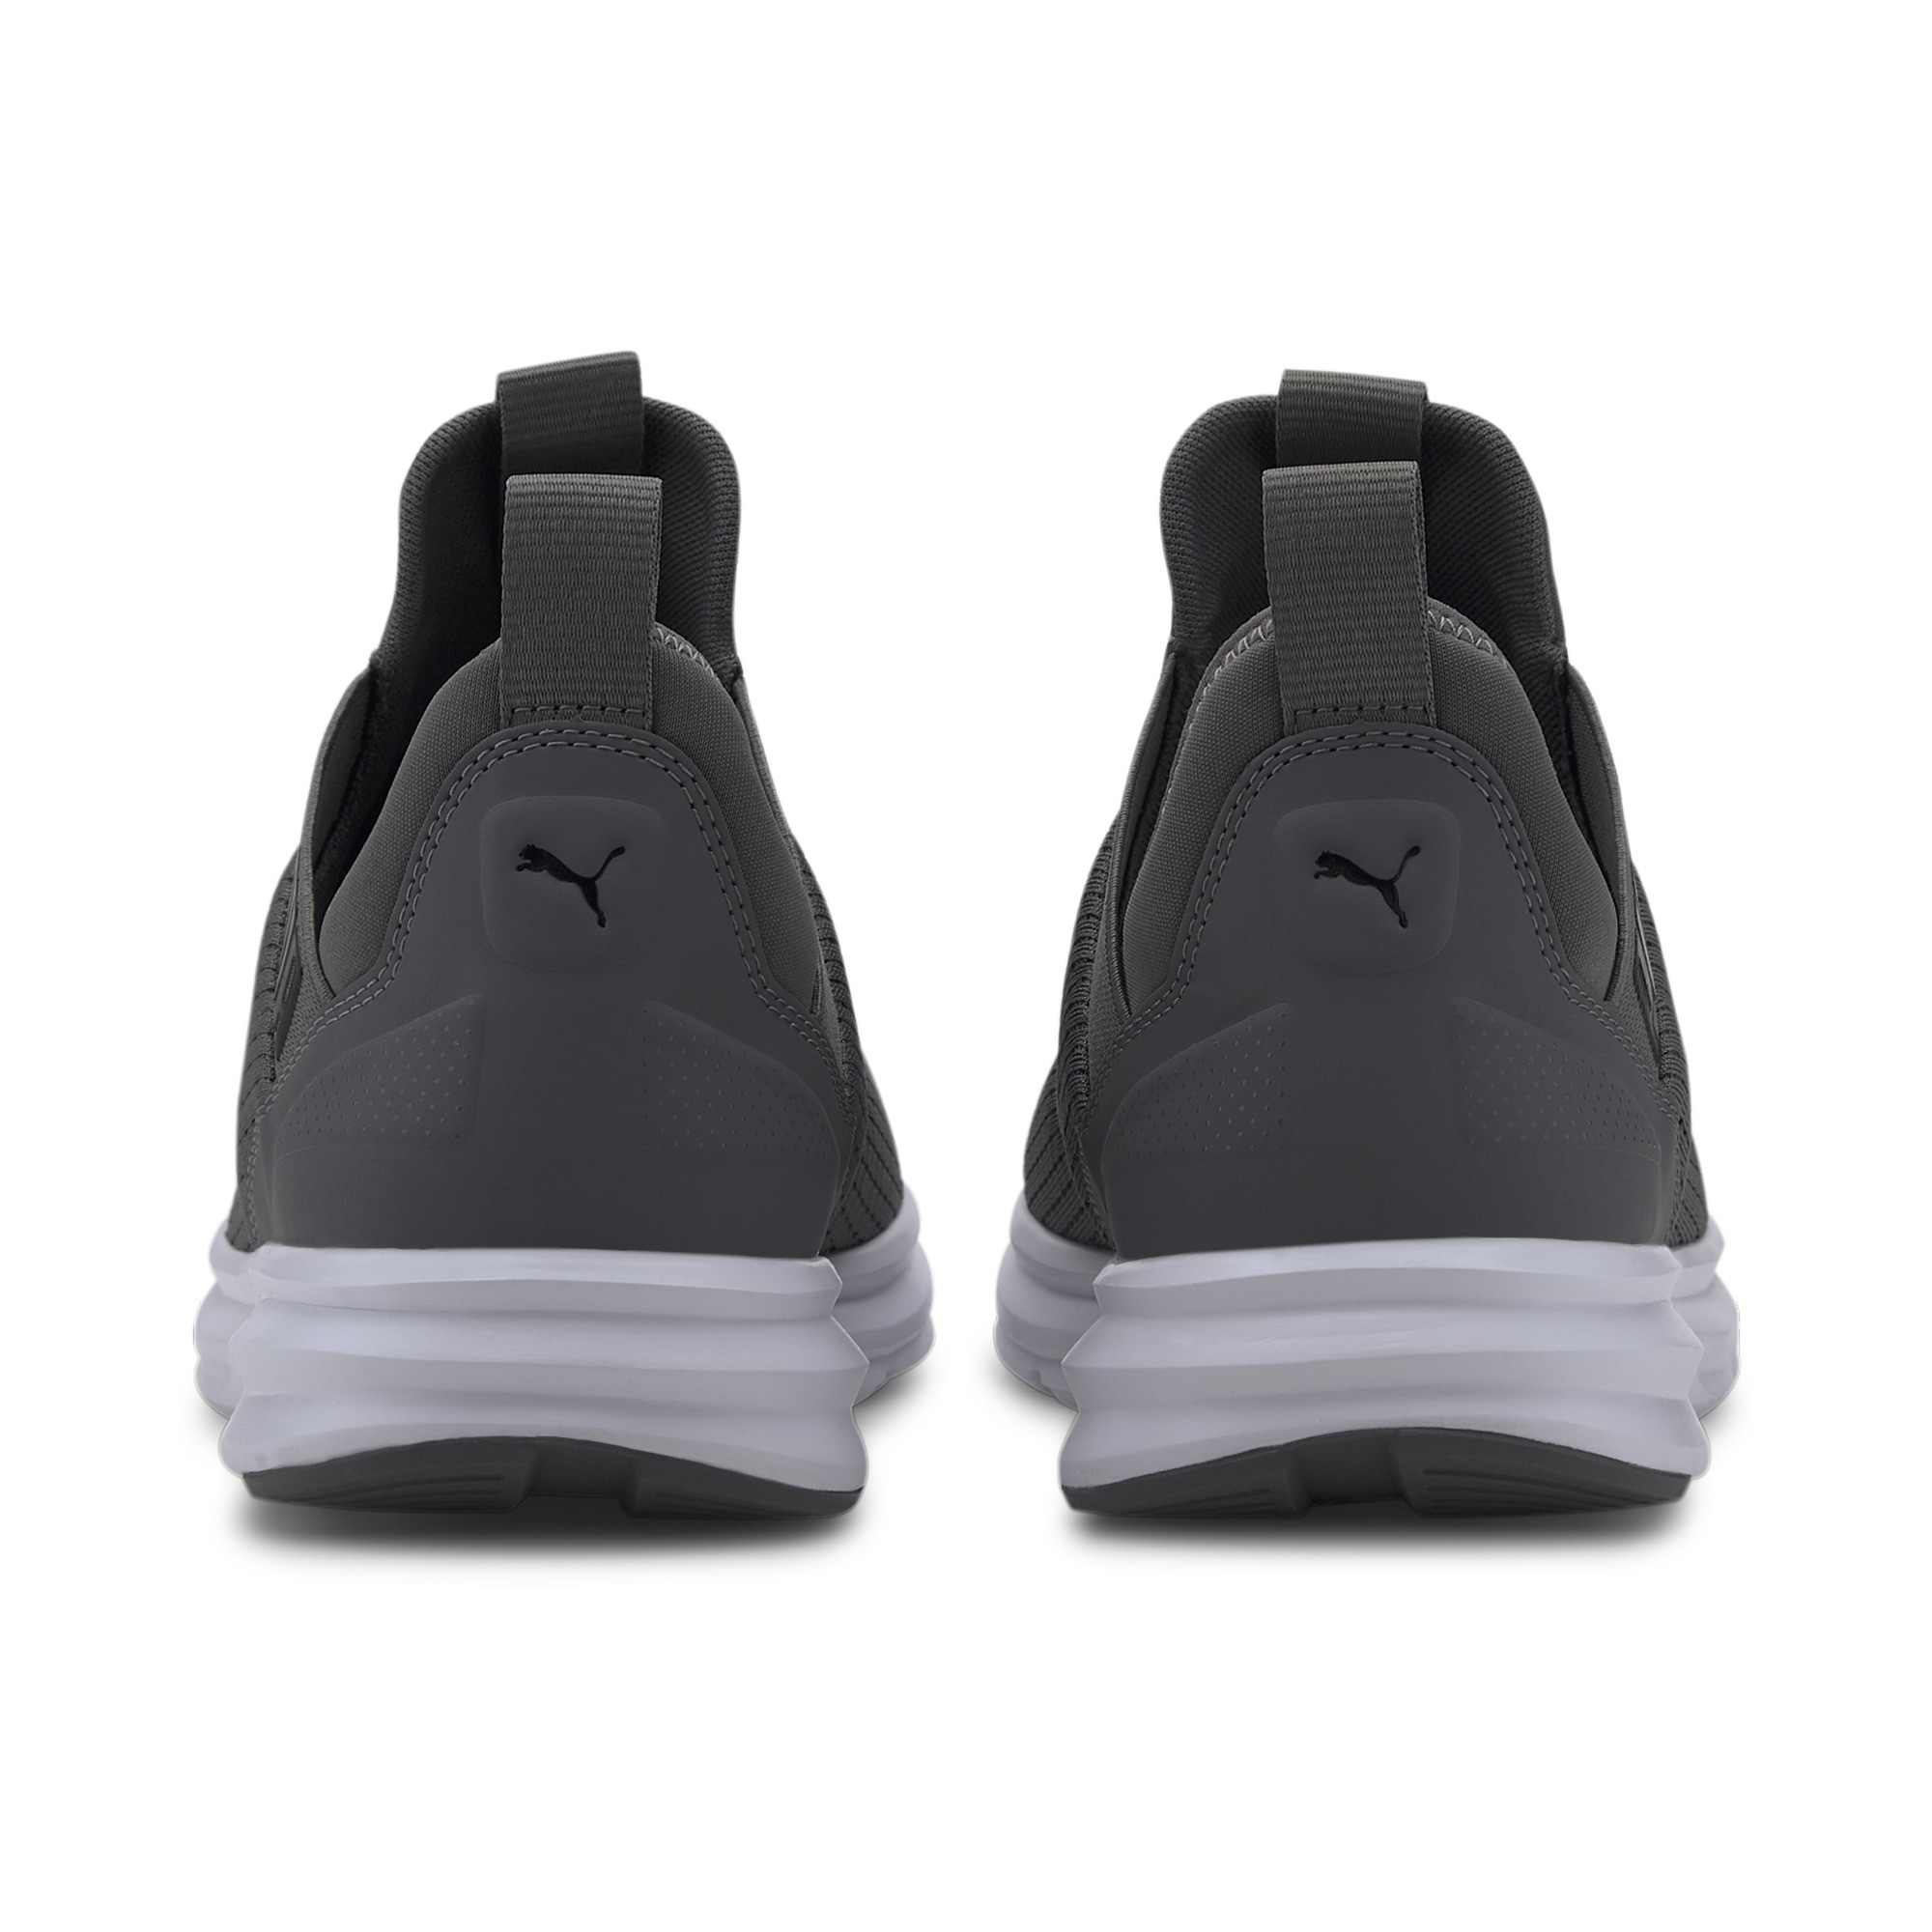 PUMA-Men-039-s-Enzo-Beta-Mesh-Training-Shoes thumbnail 10